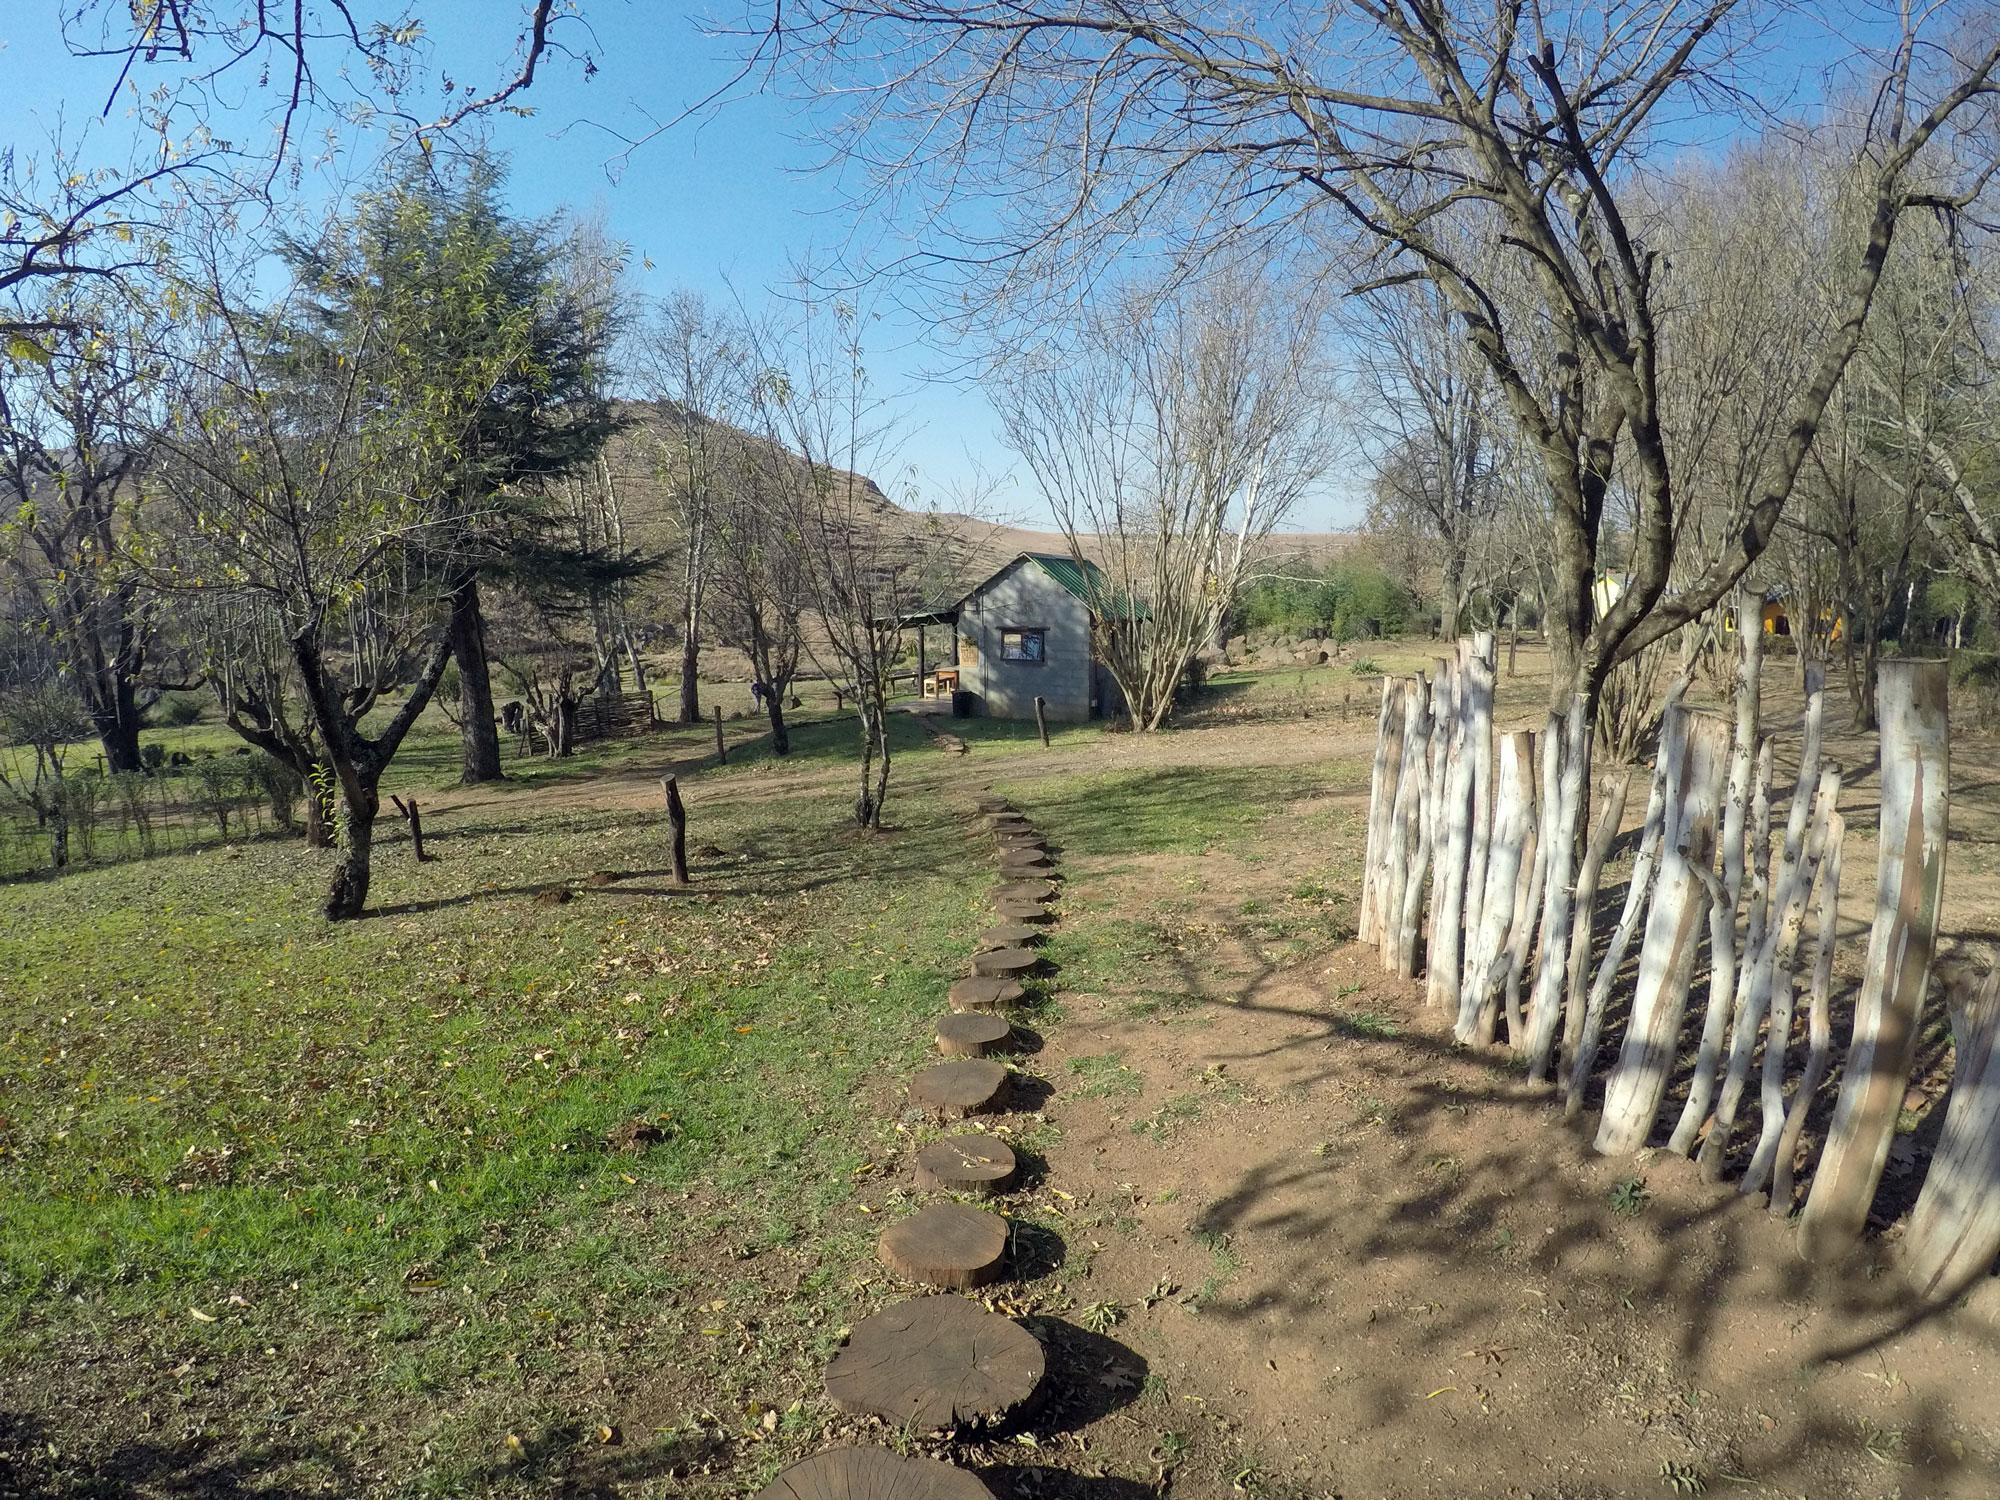 Khotso Lodge & Horse Trails | Campsite & Overlanders